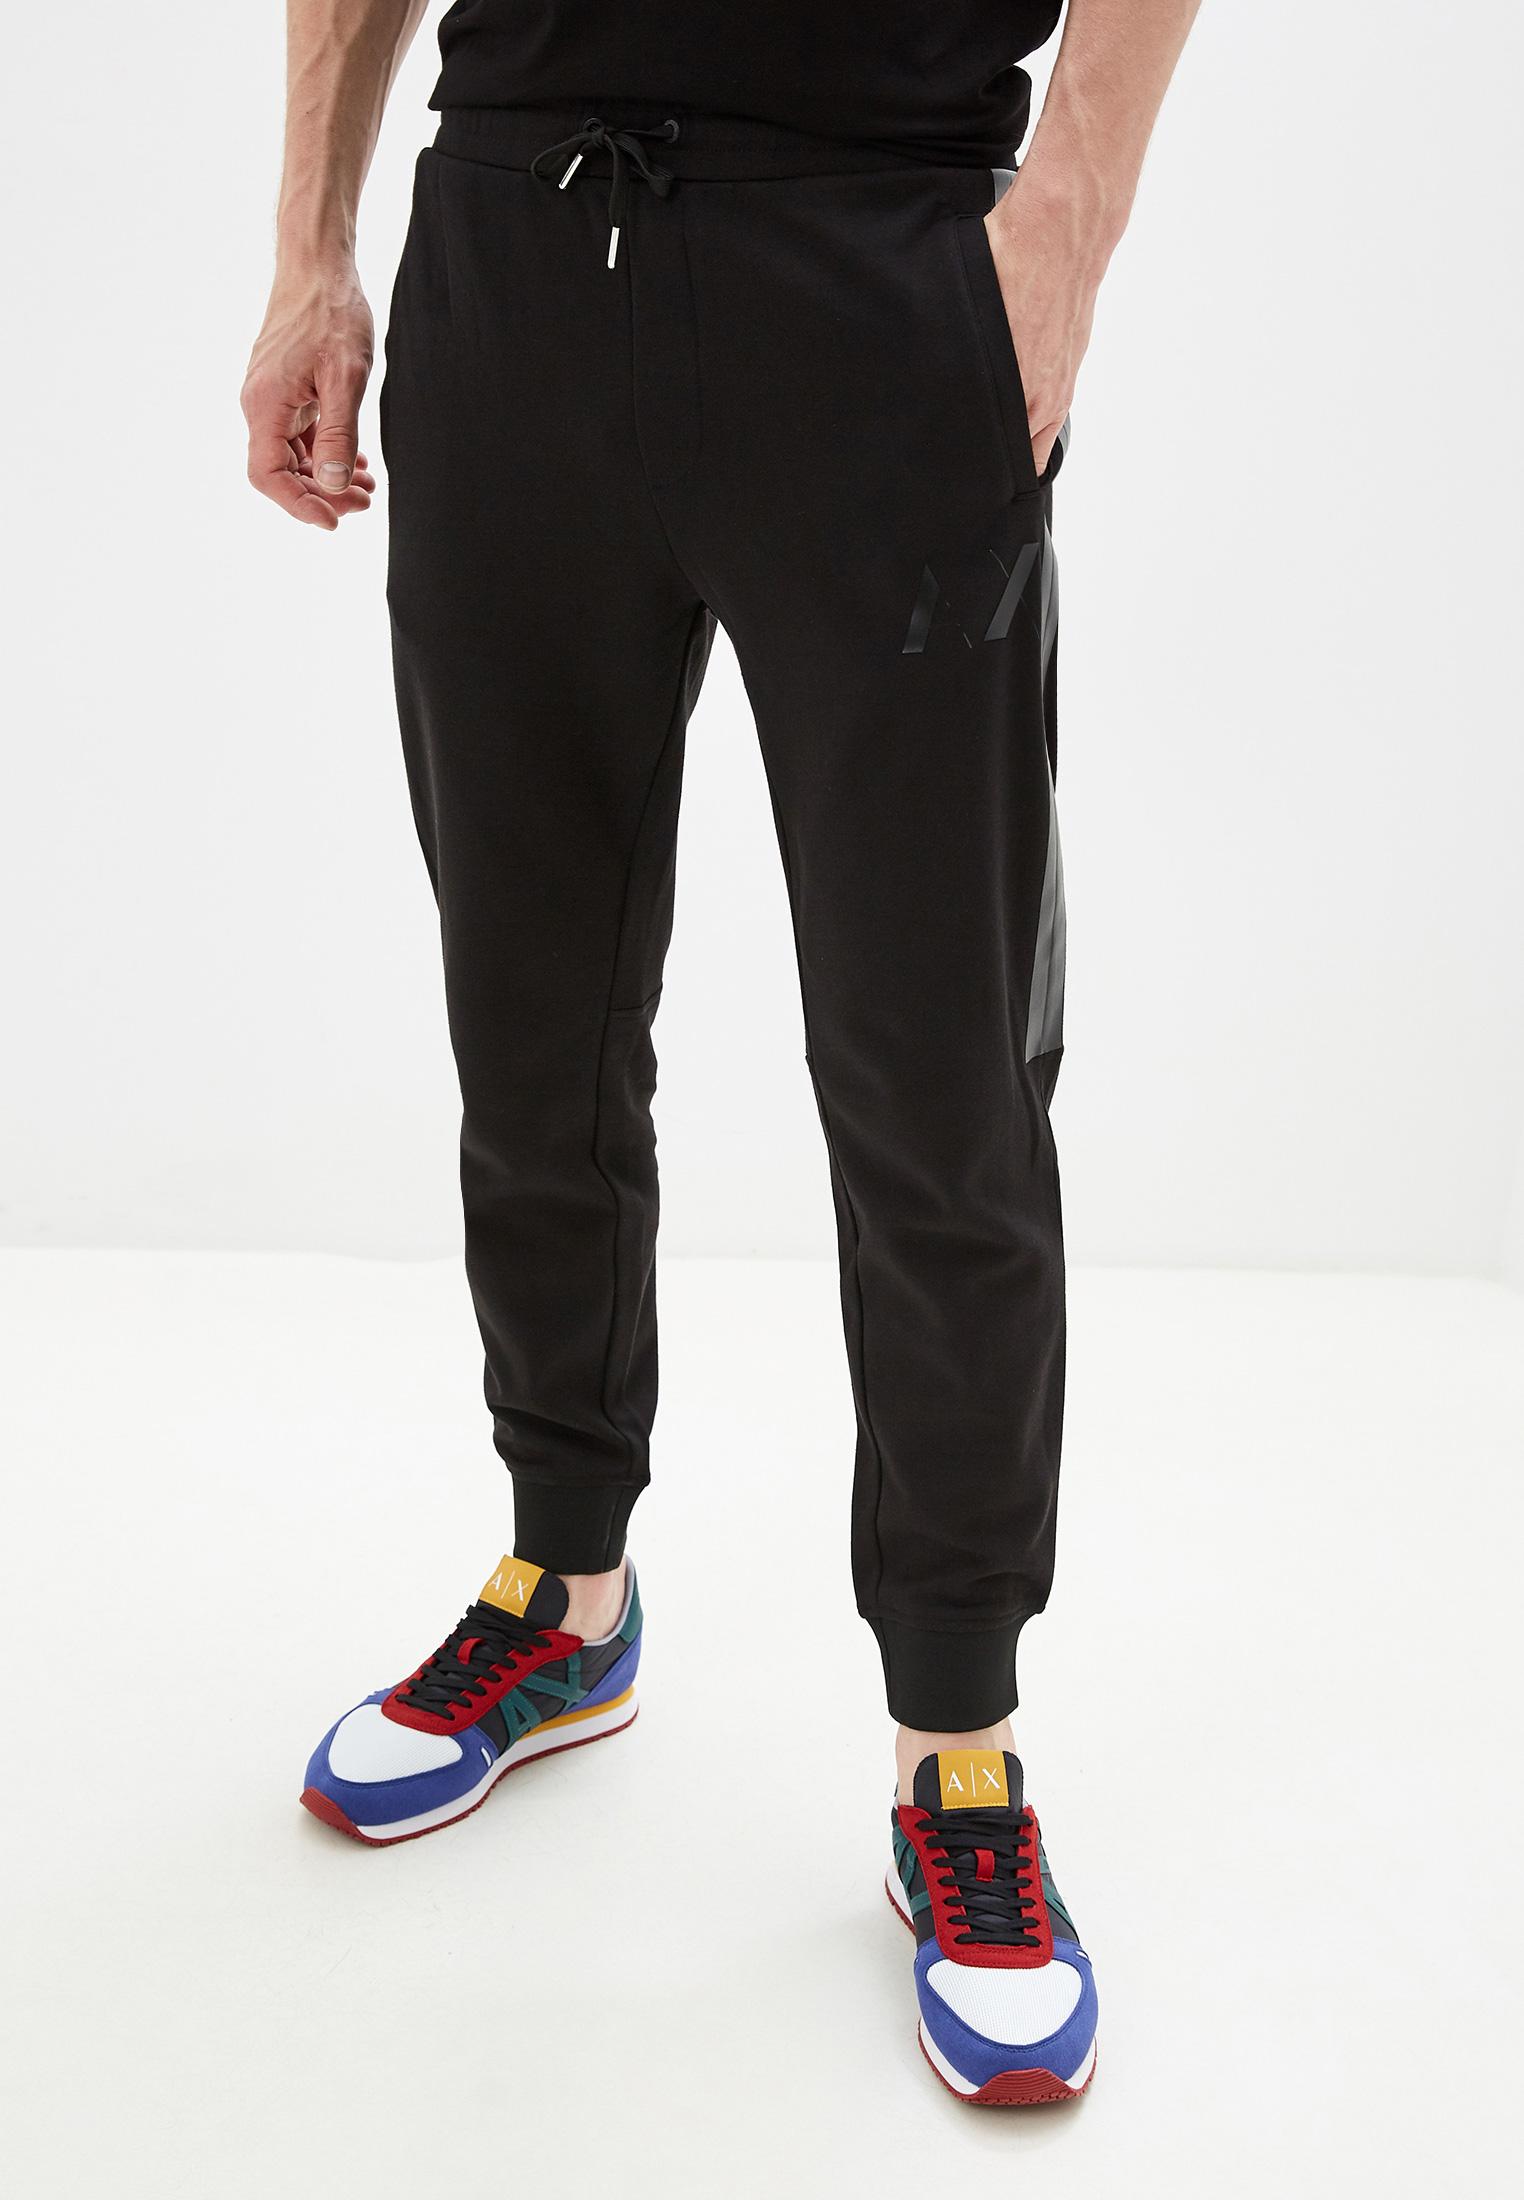 Мужские спортивные брюки Armani Exchange 6gzpah ZJ1PZ